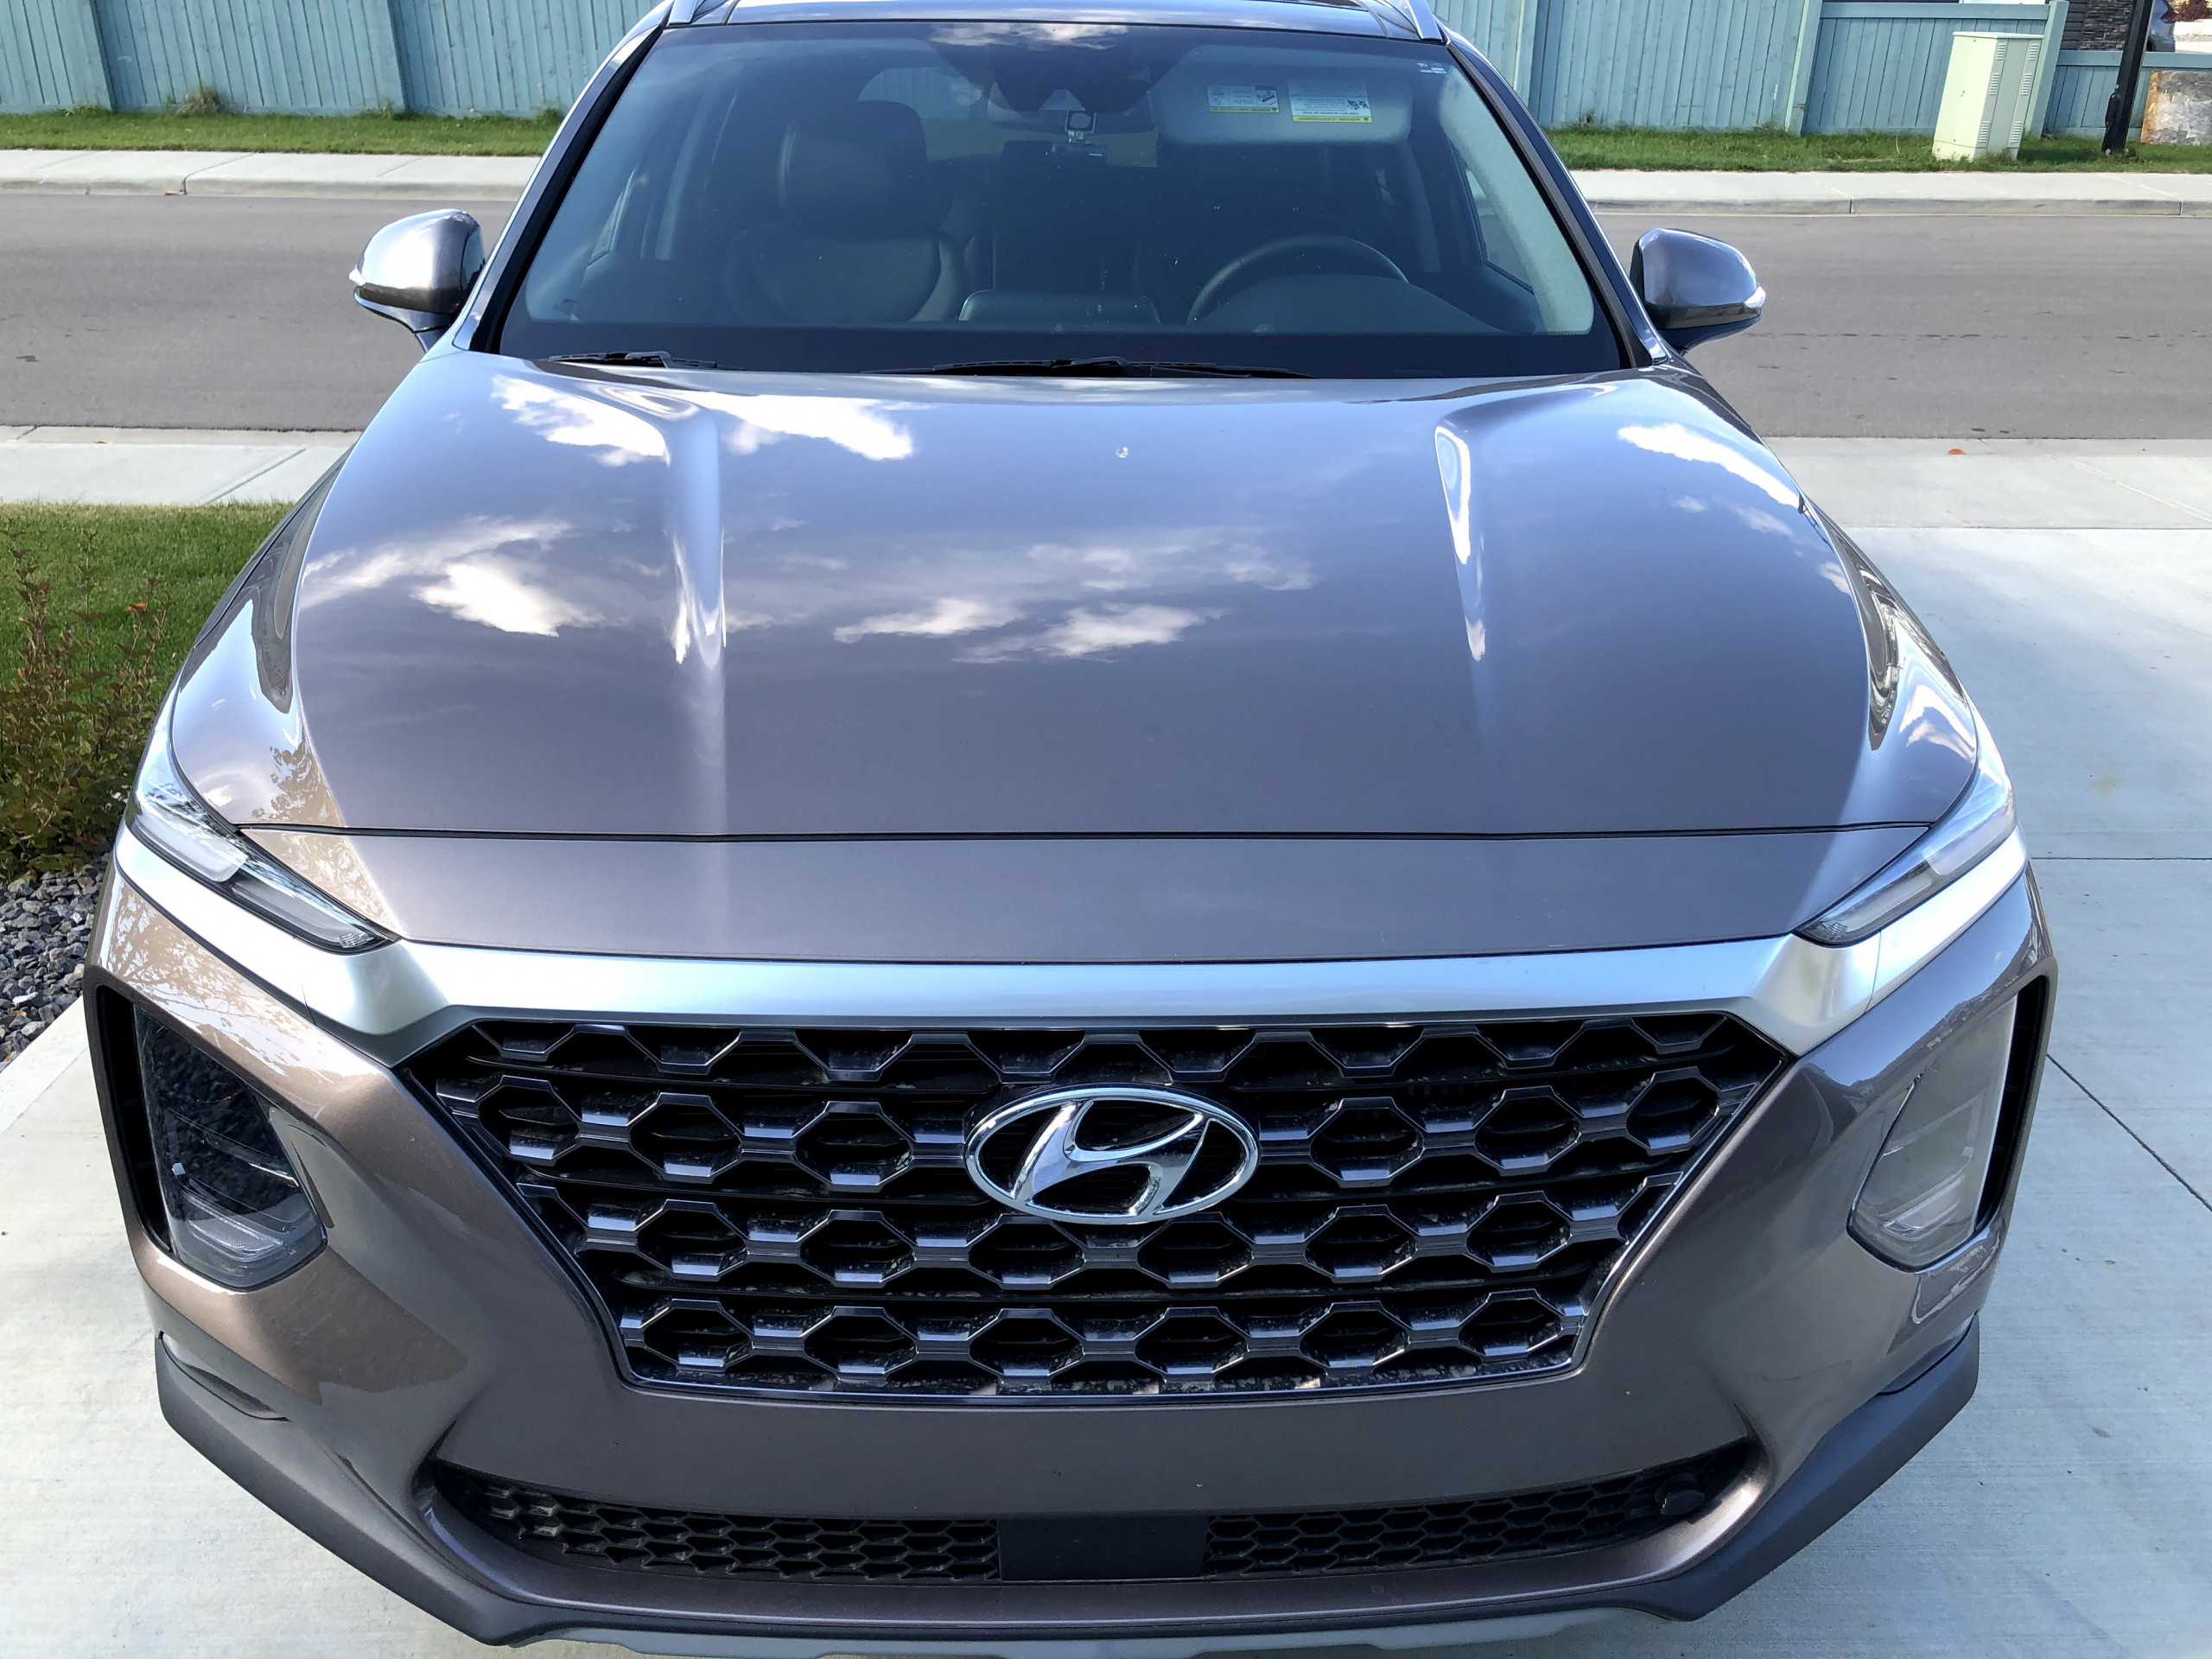 2020 Hyundai Santa Fe before enhancement detail